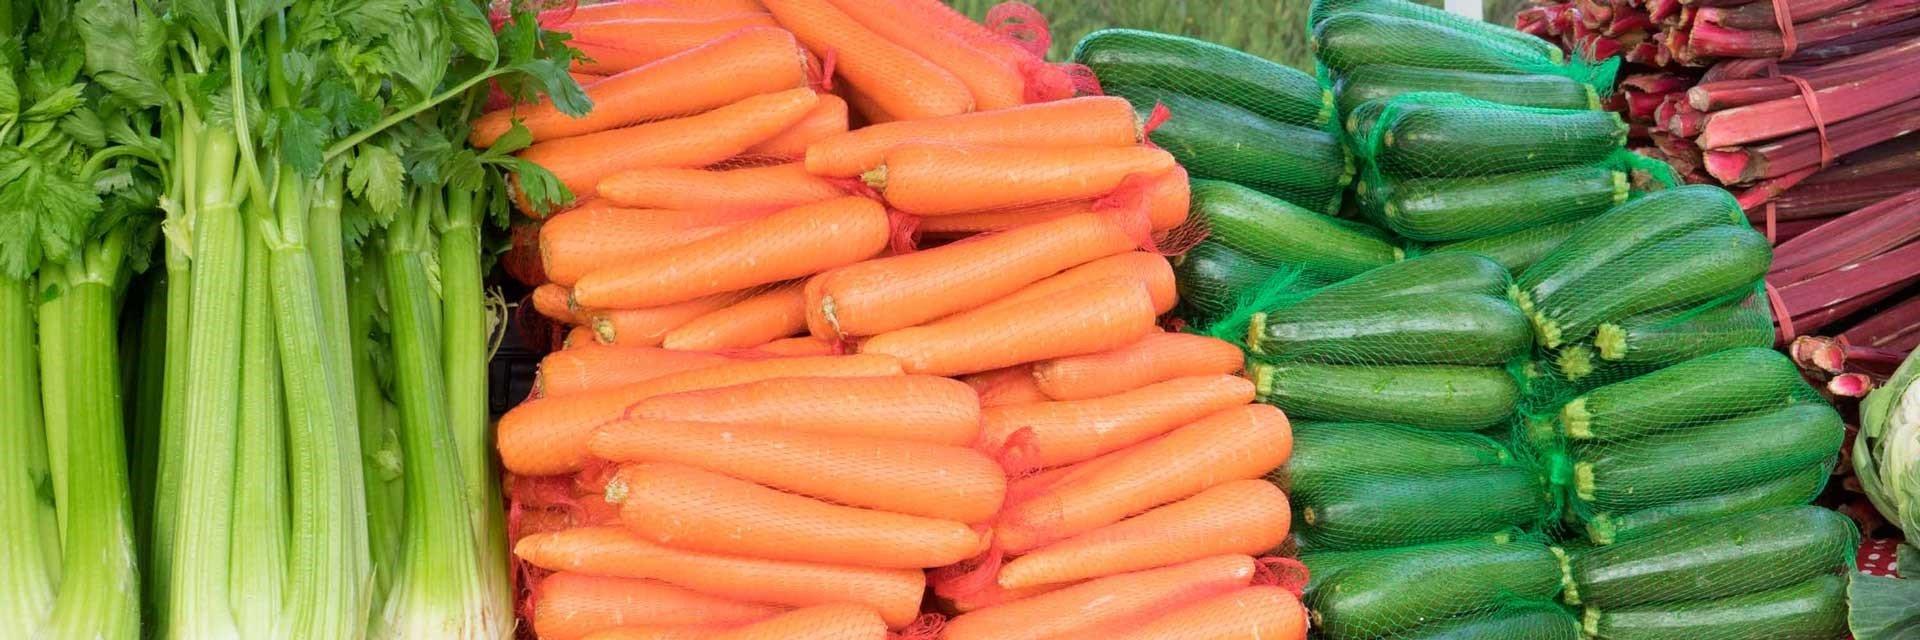 organic-vegetables-1-1920